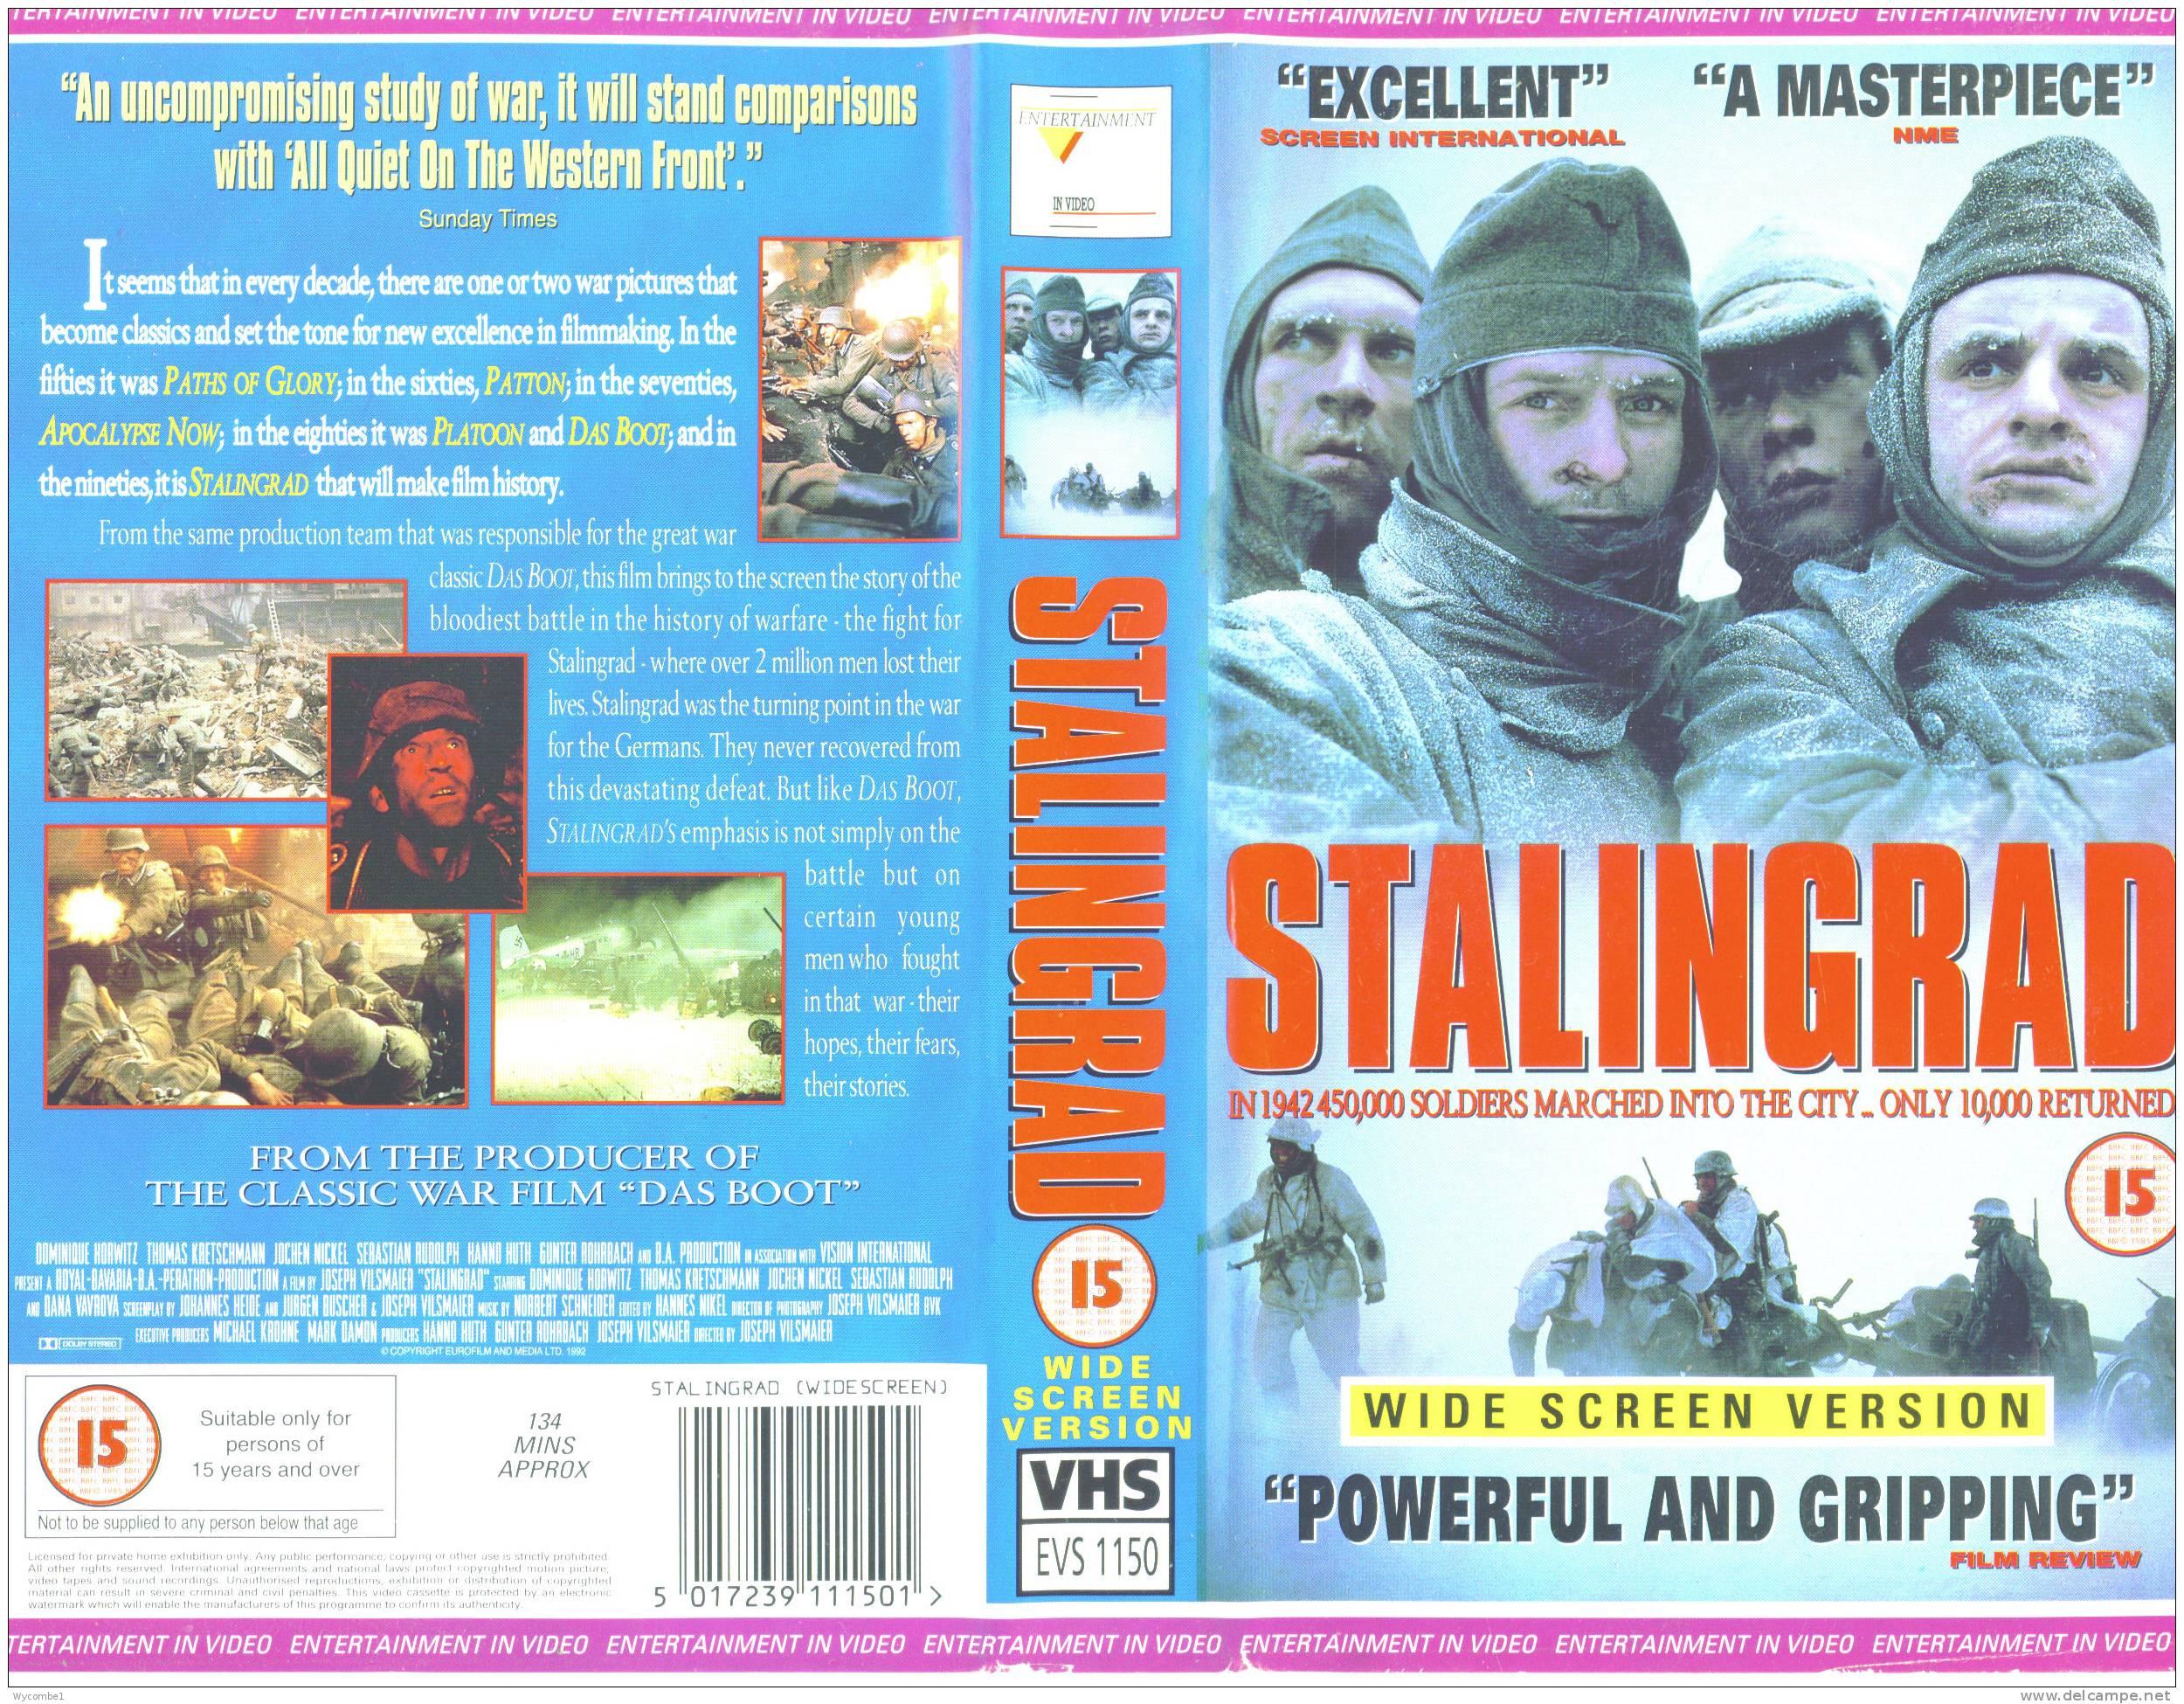 STALINGRAD - Dominique Horwitz (For Full Details See Scan) - Geschichte